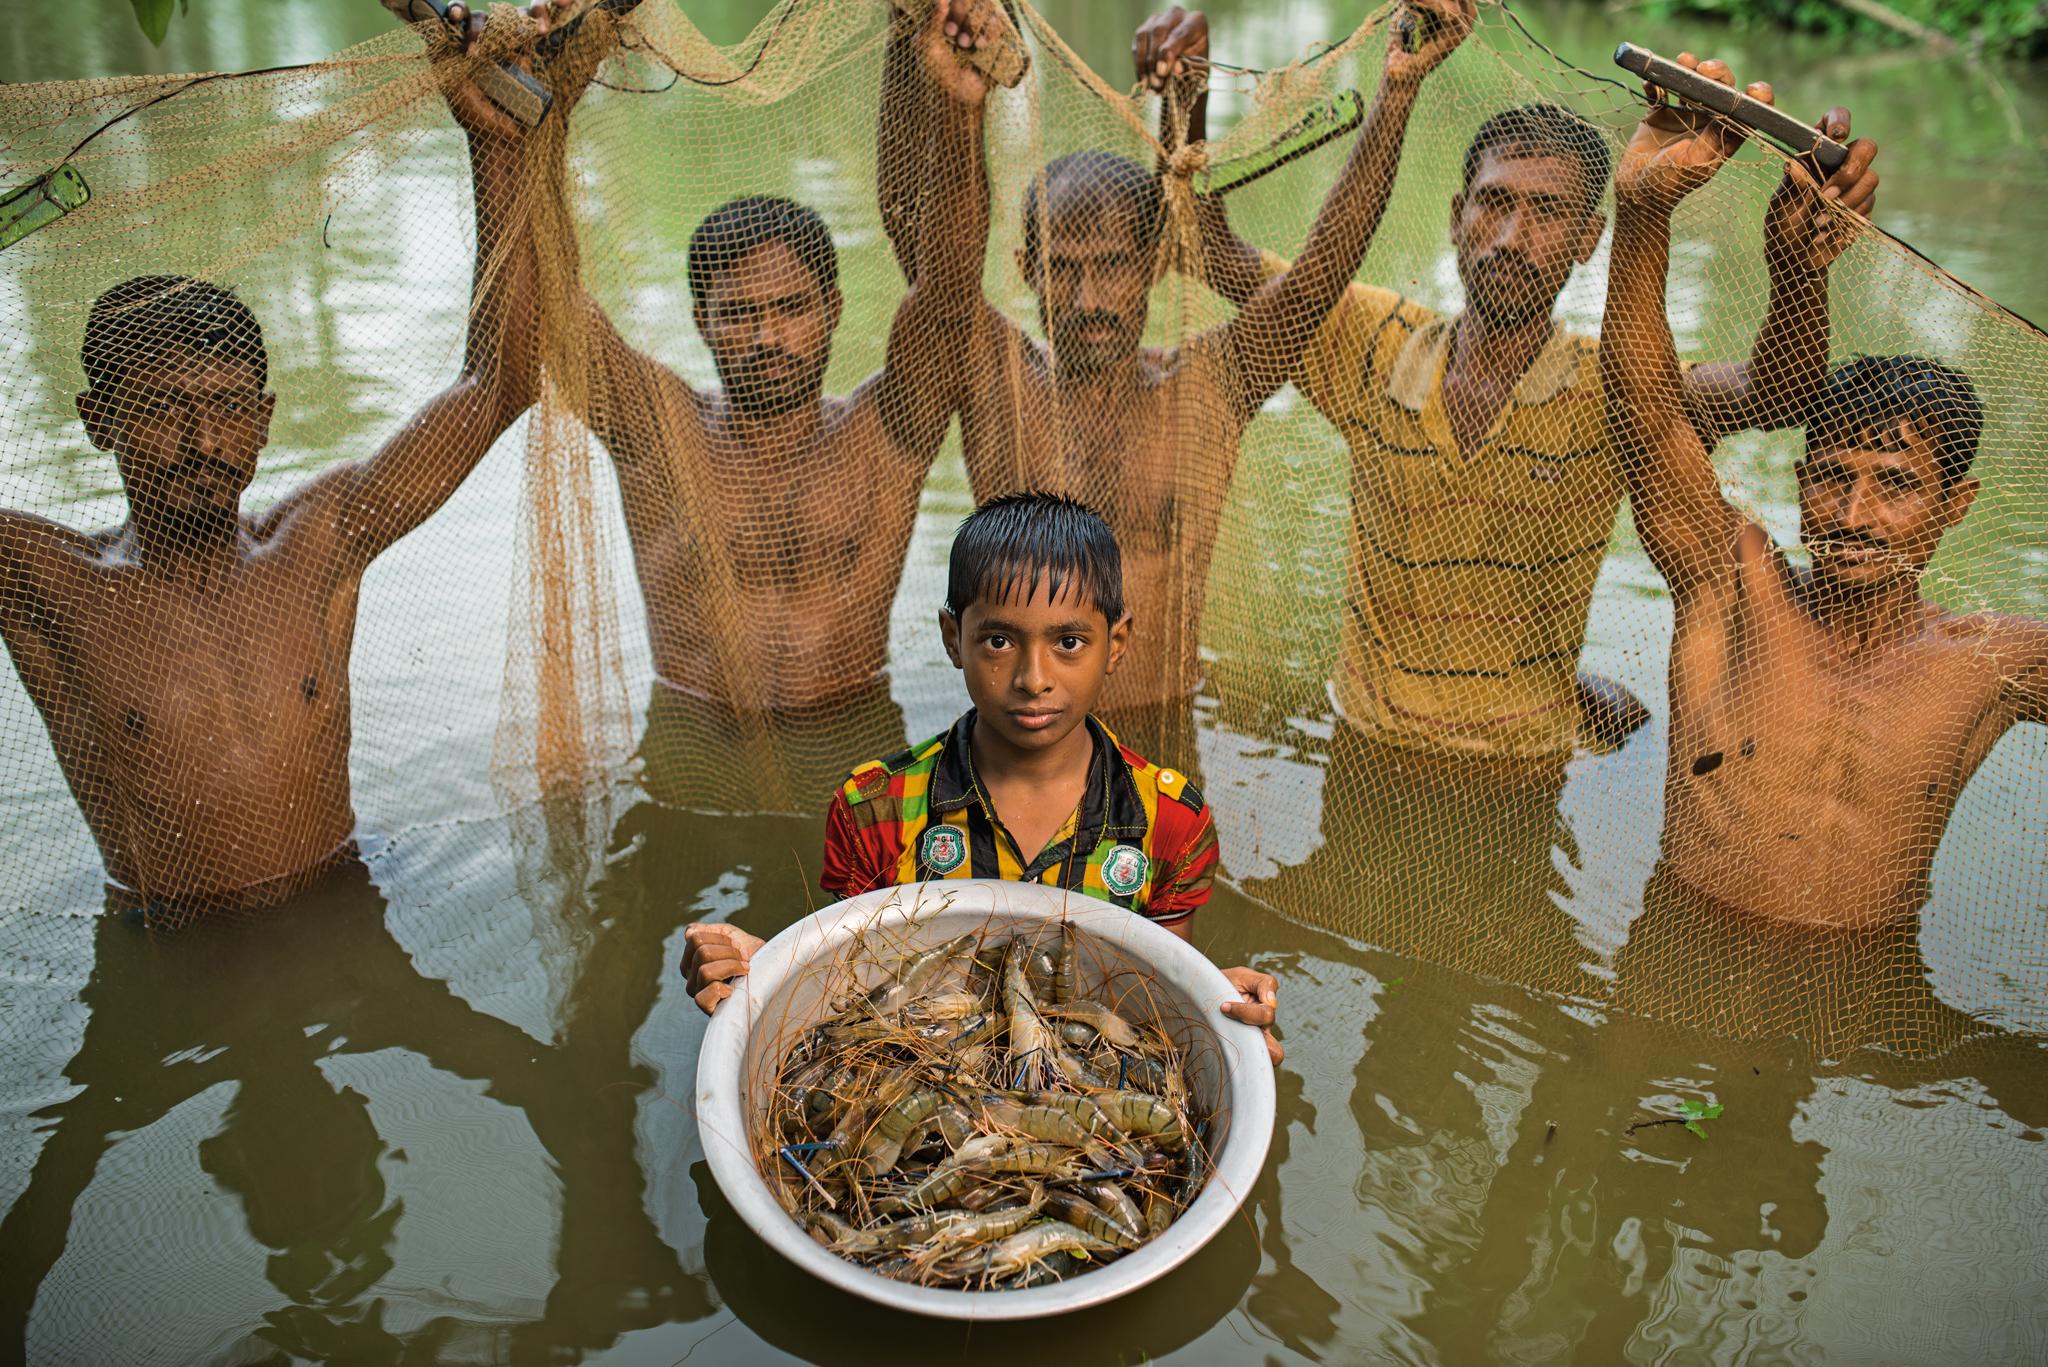 Fish aquarium in bangladesh - Picture Of A Fish Harvest In Bangladesh